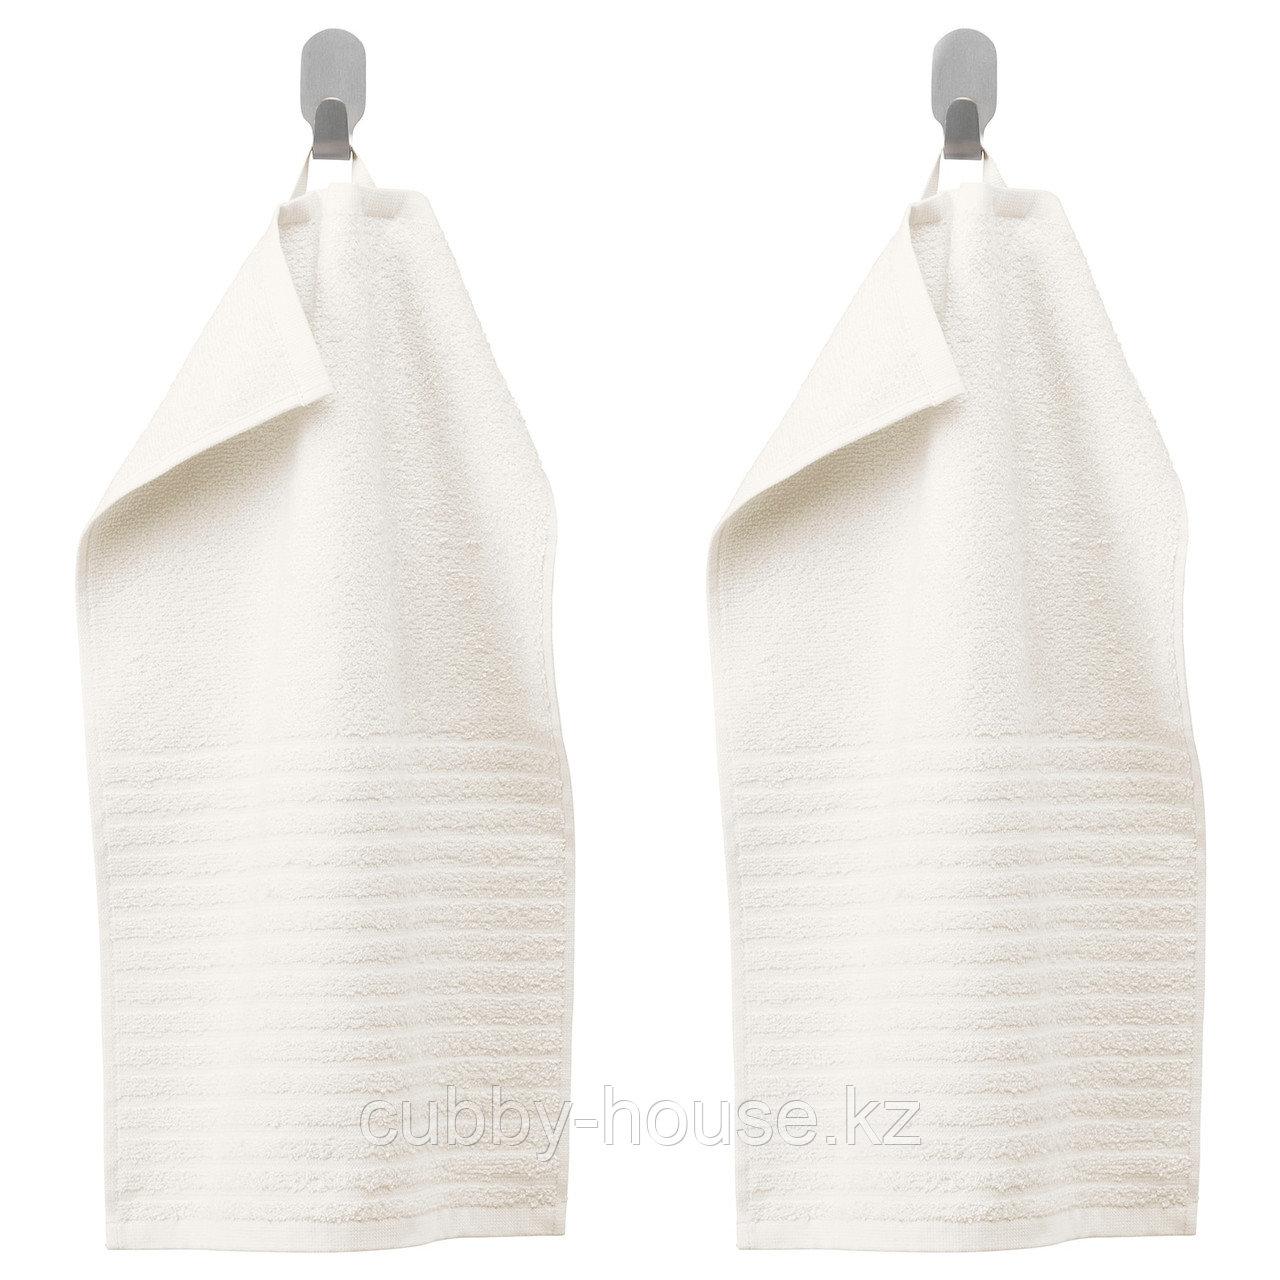 ВОГШЁН Полотенце, белый, 30x50 см